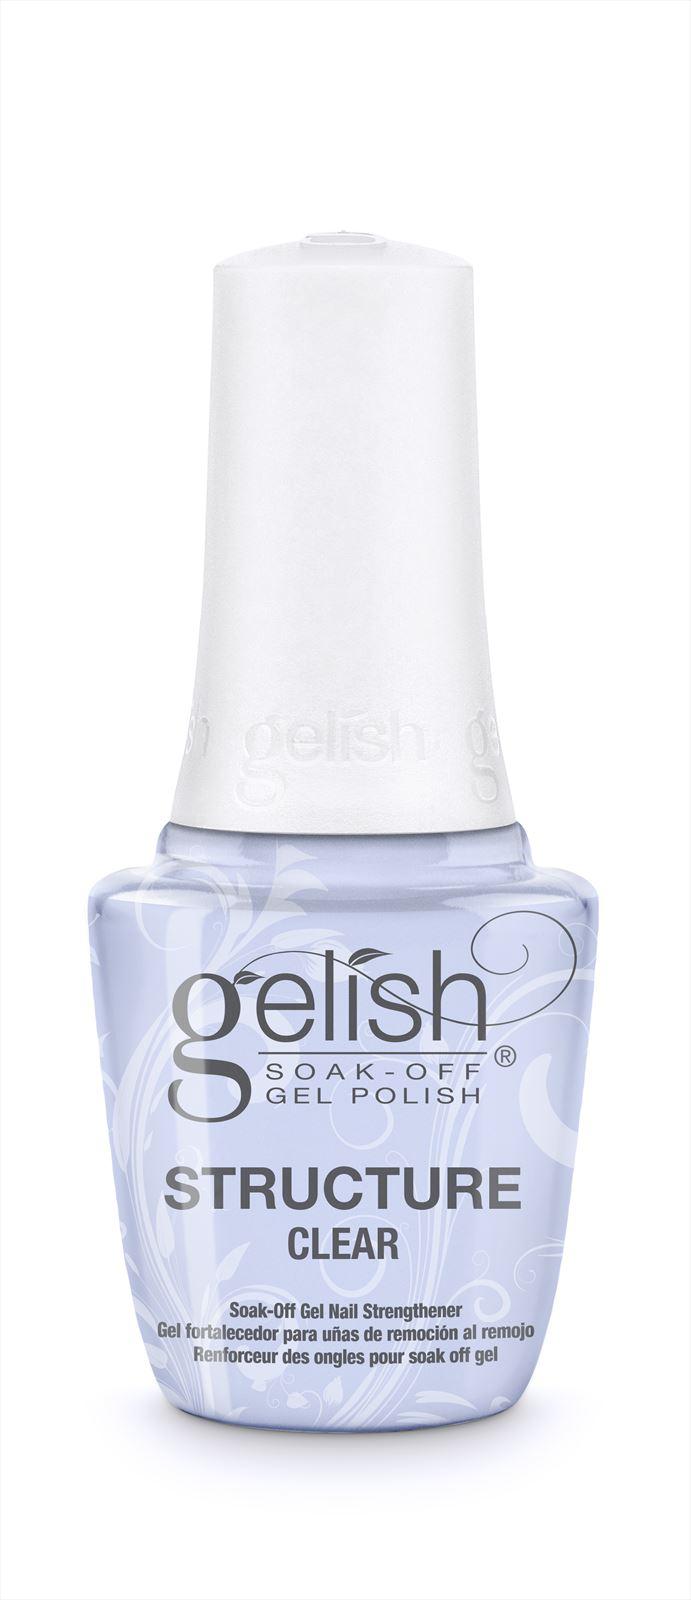 Afbeelding van Gelish Clear Brush on Structure